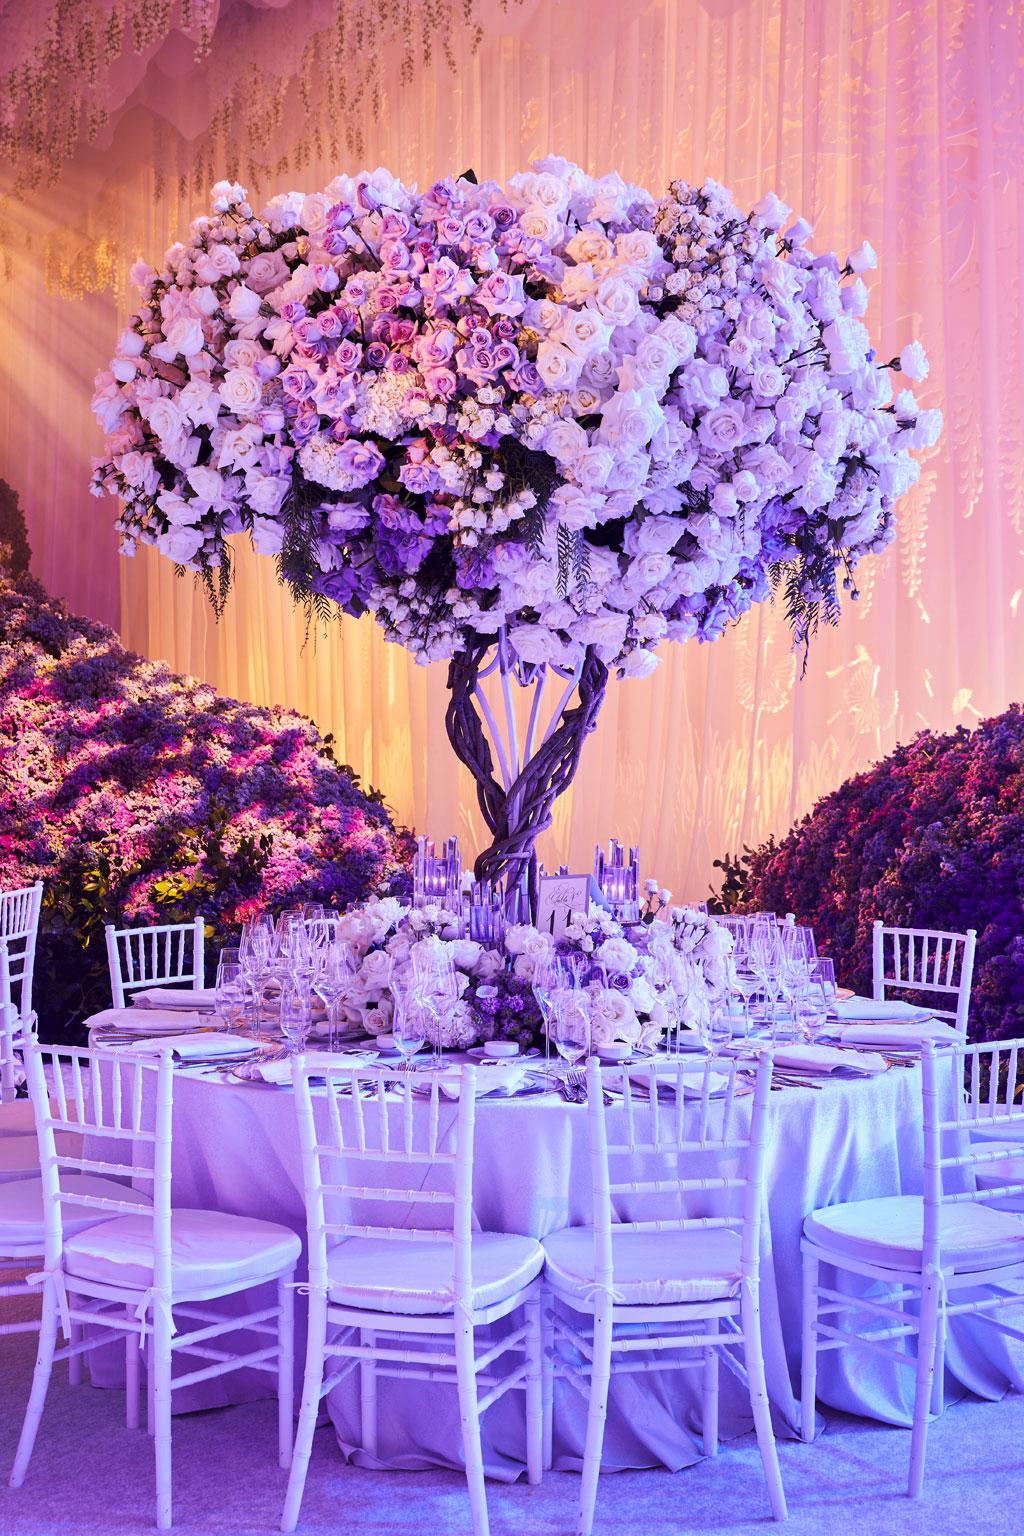 Mark's Garden fertitta wedding